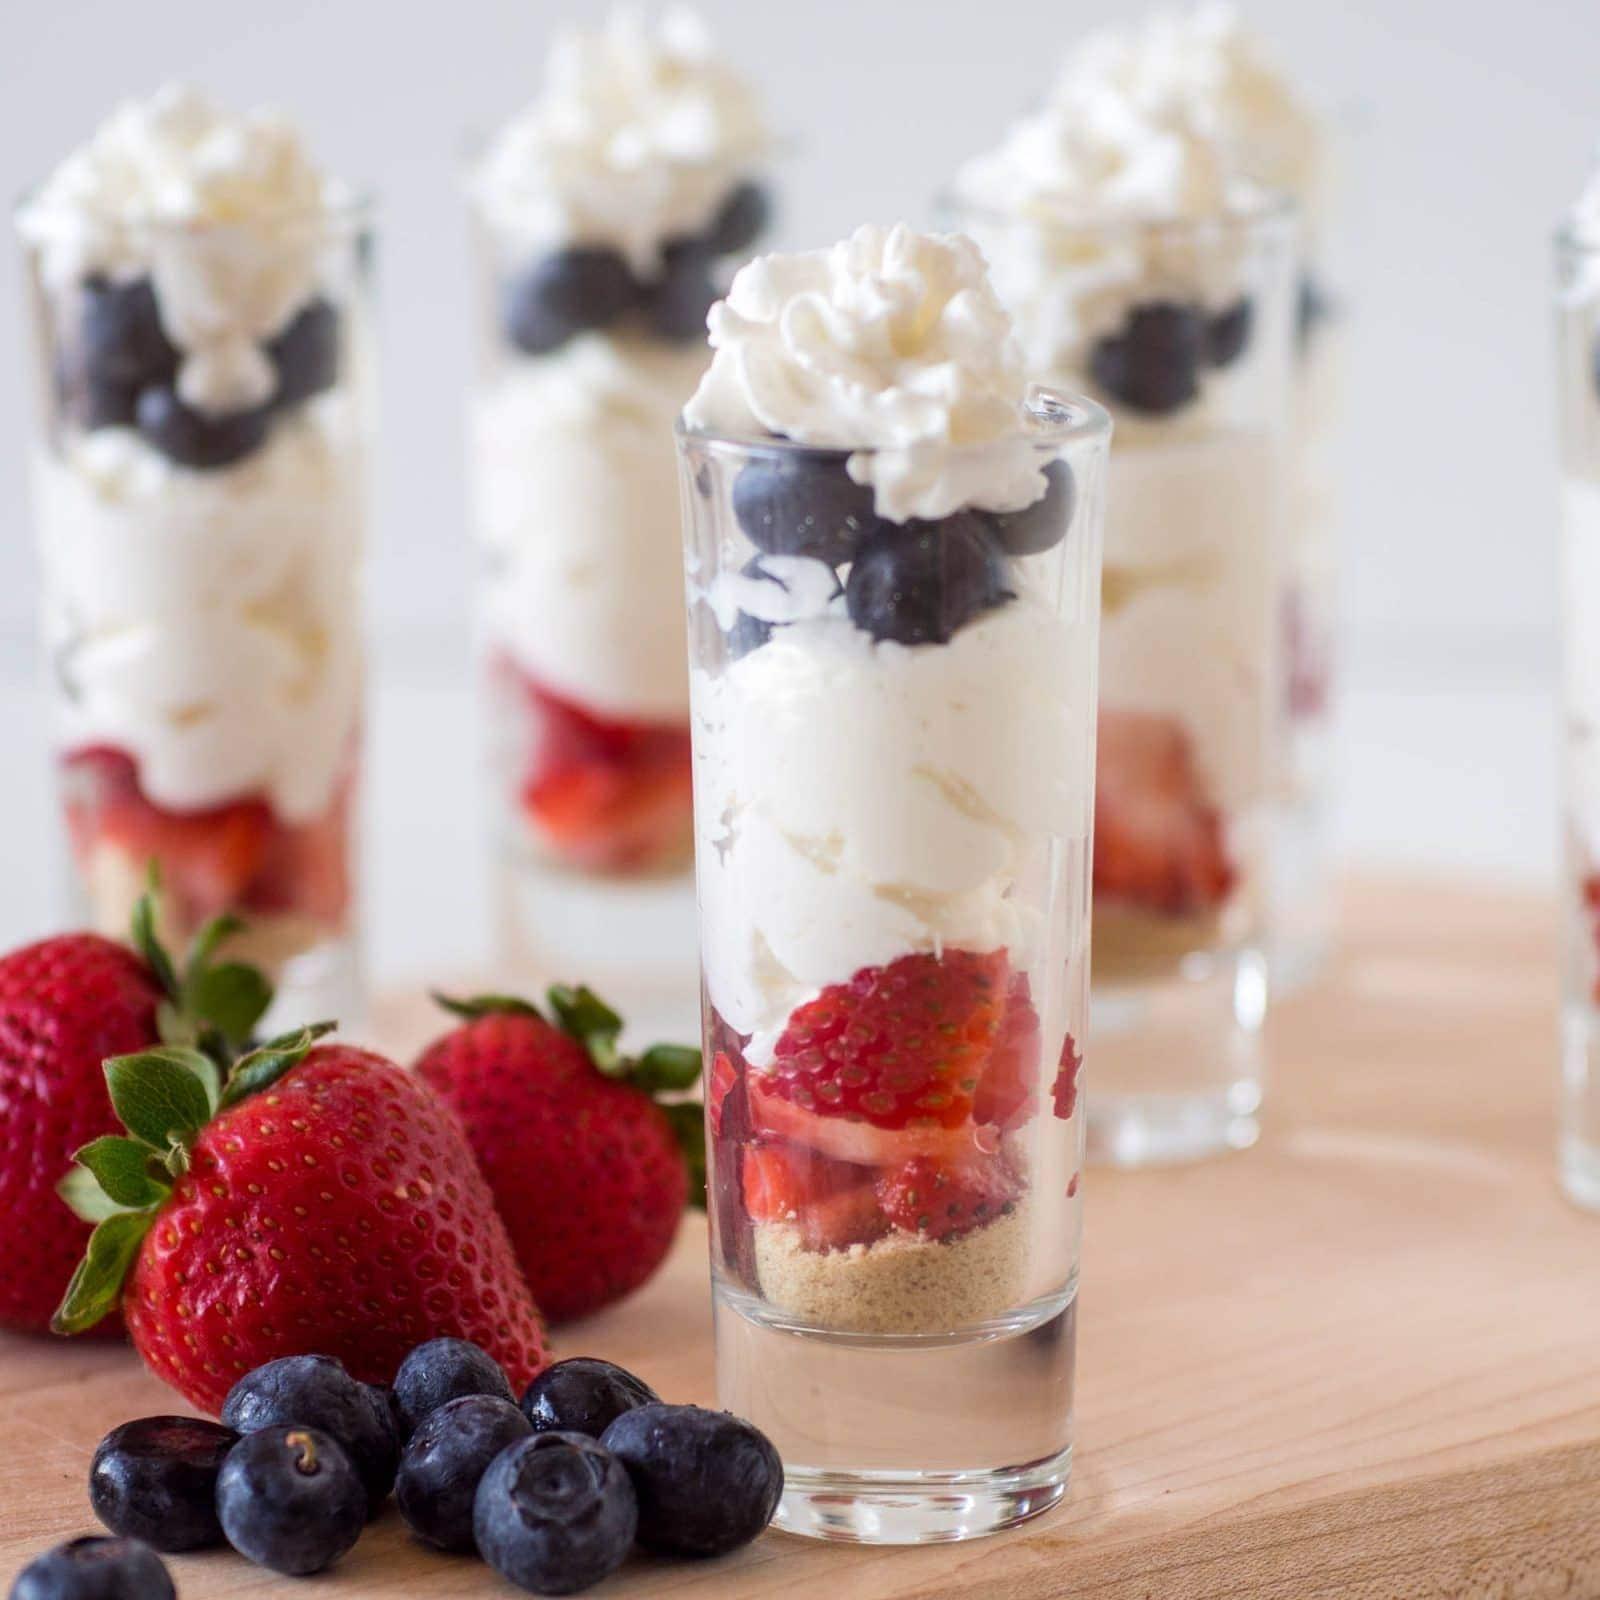 Easy 4th of July Dessert - no bake